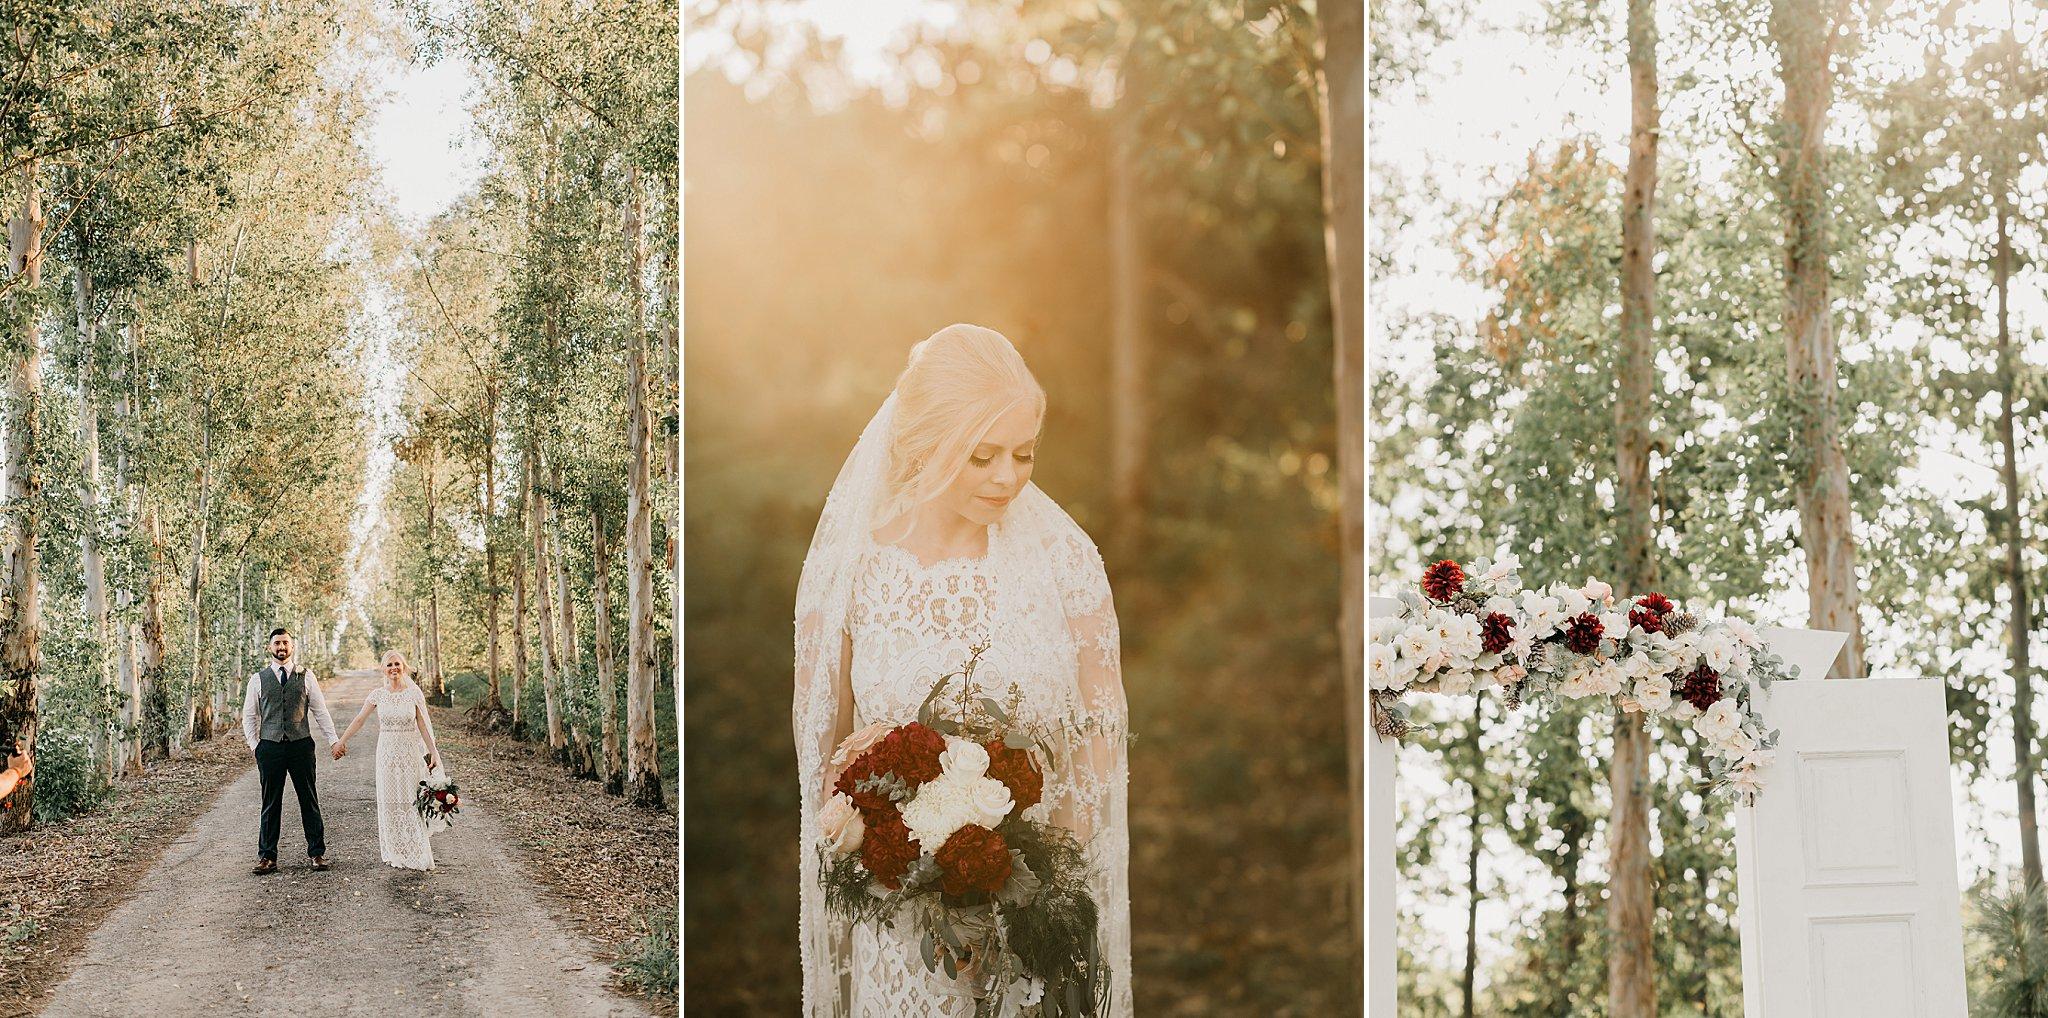 JessicaBordnerPhotography_3981.jpg